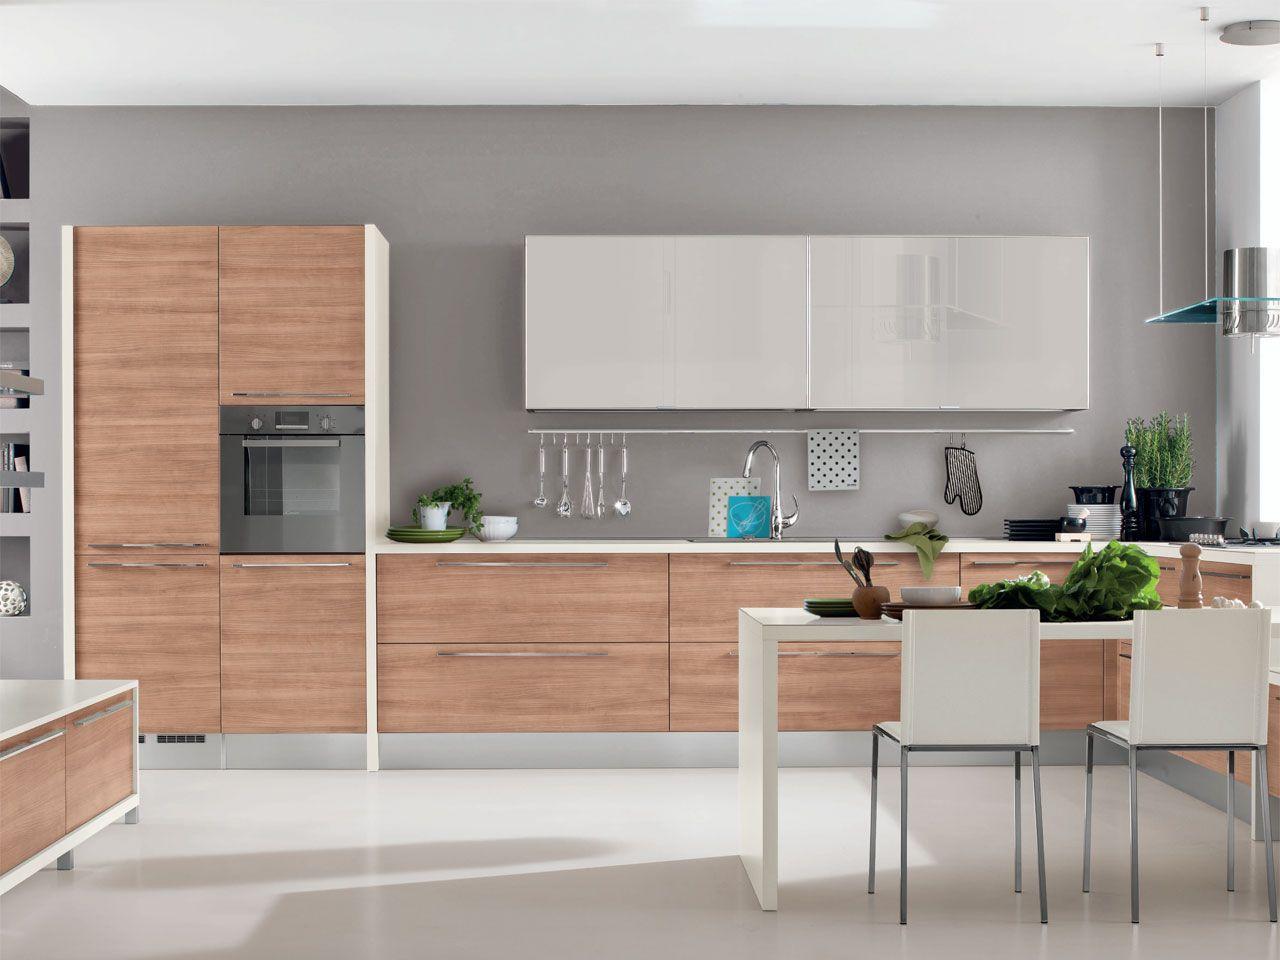 NOEMI | Wooden kitchen By Cucine Lube design Studio Ferriani